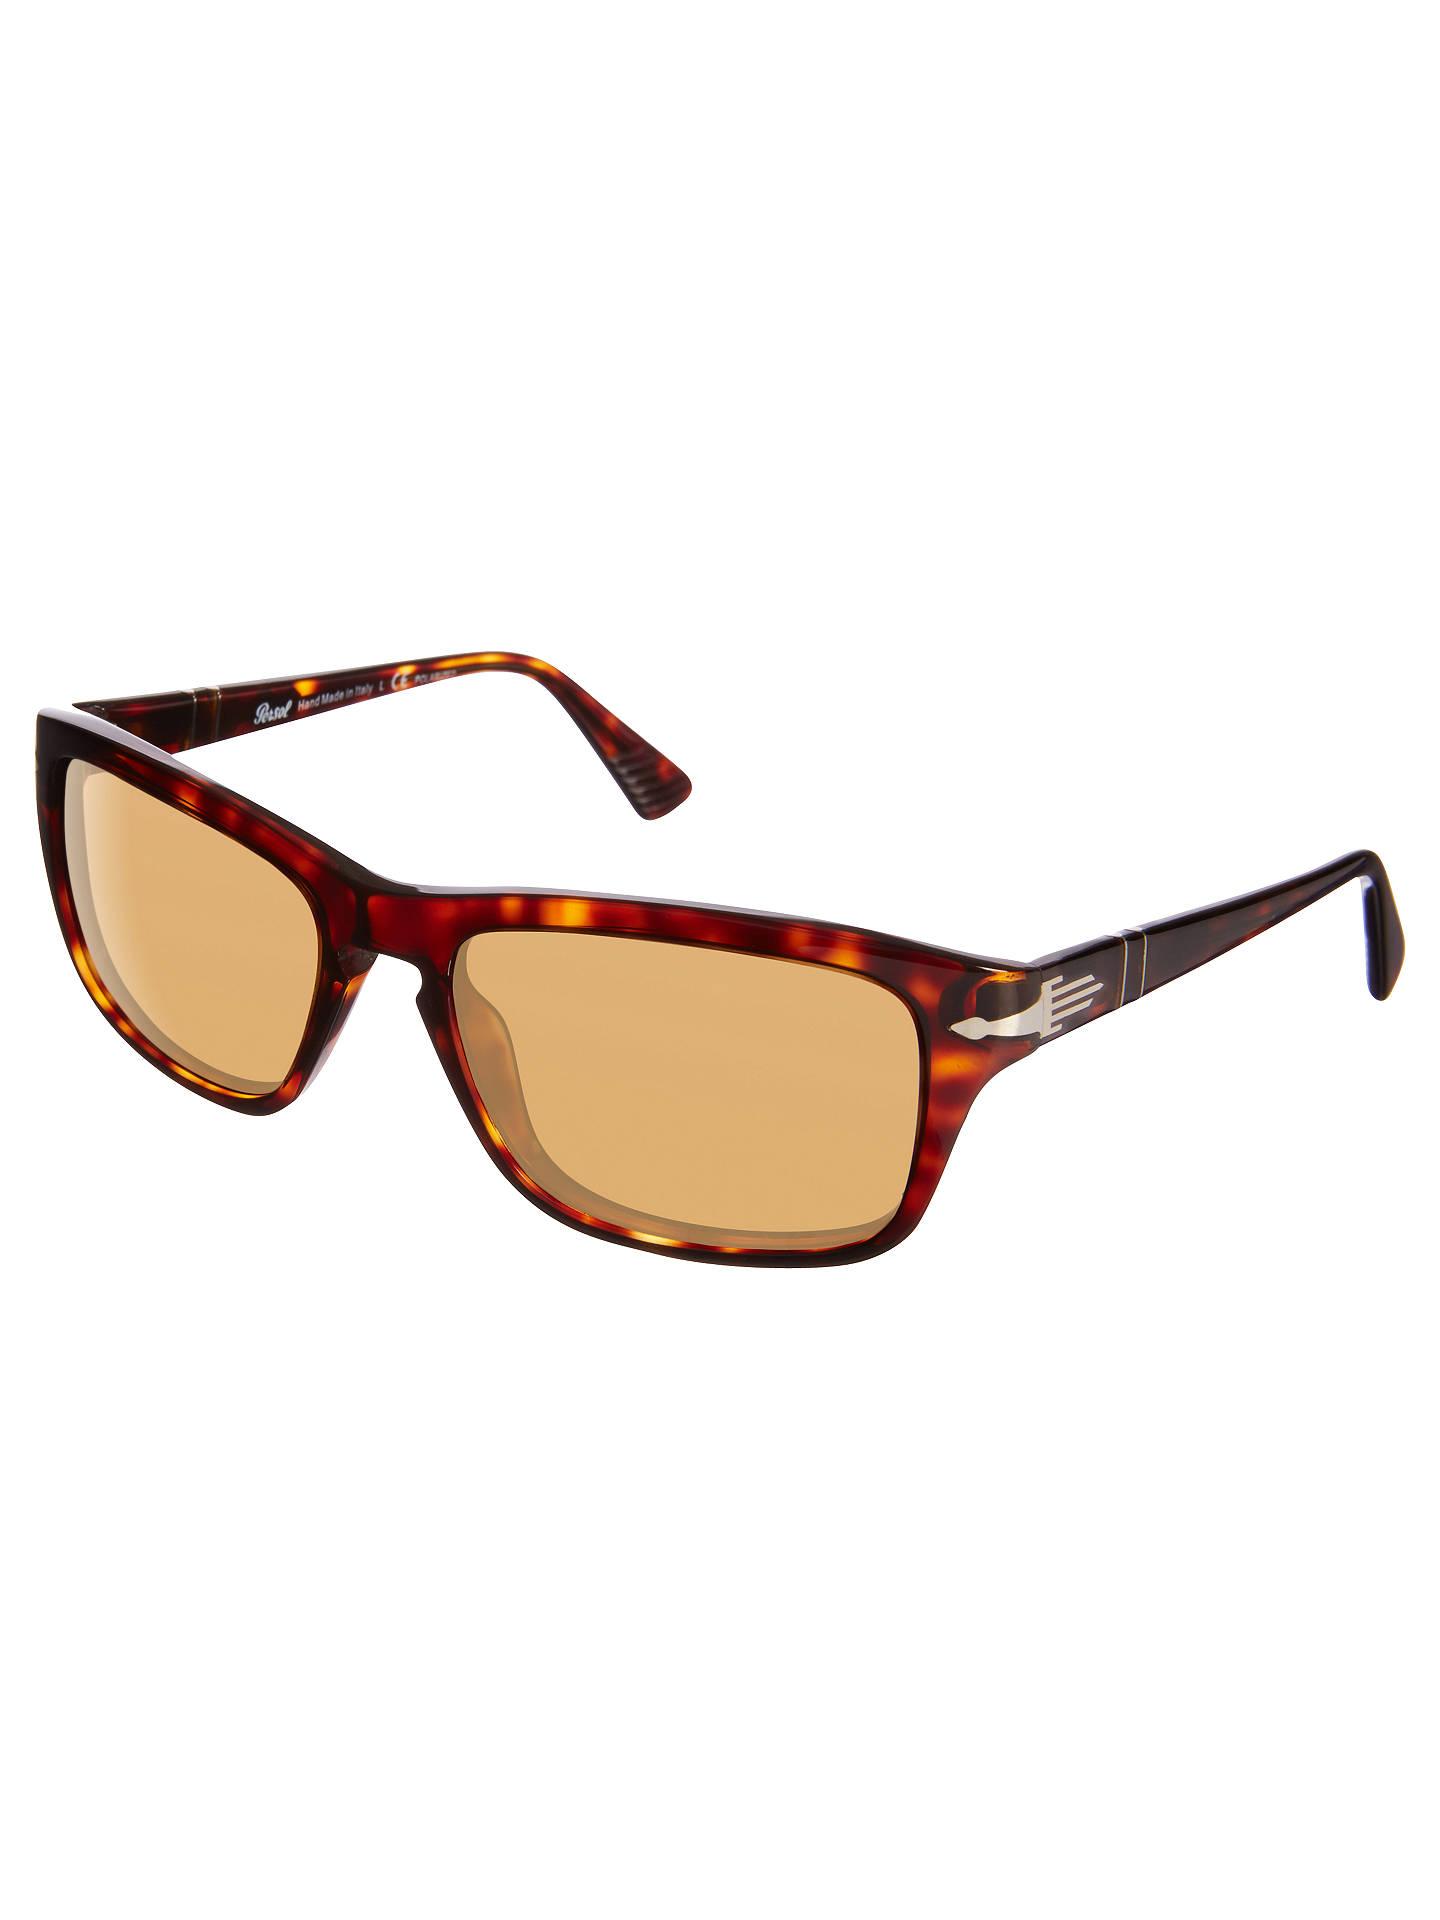 74ff76a4f311 Buy Persol PO3074S Polarised Rectangular Sunglasses, Tortoise Online at  johnlewis.com ...